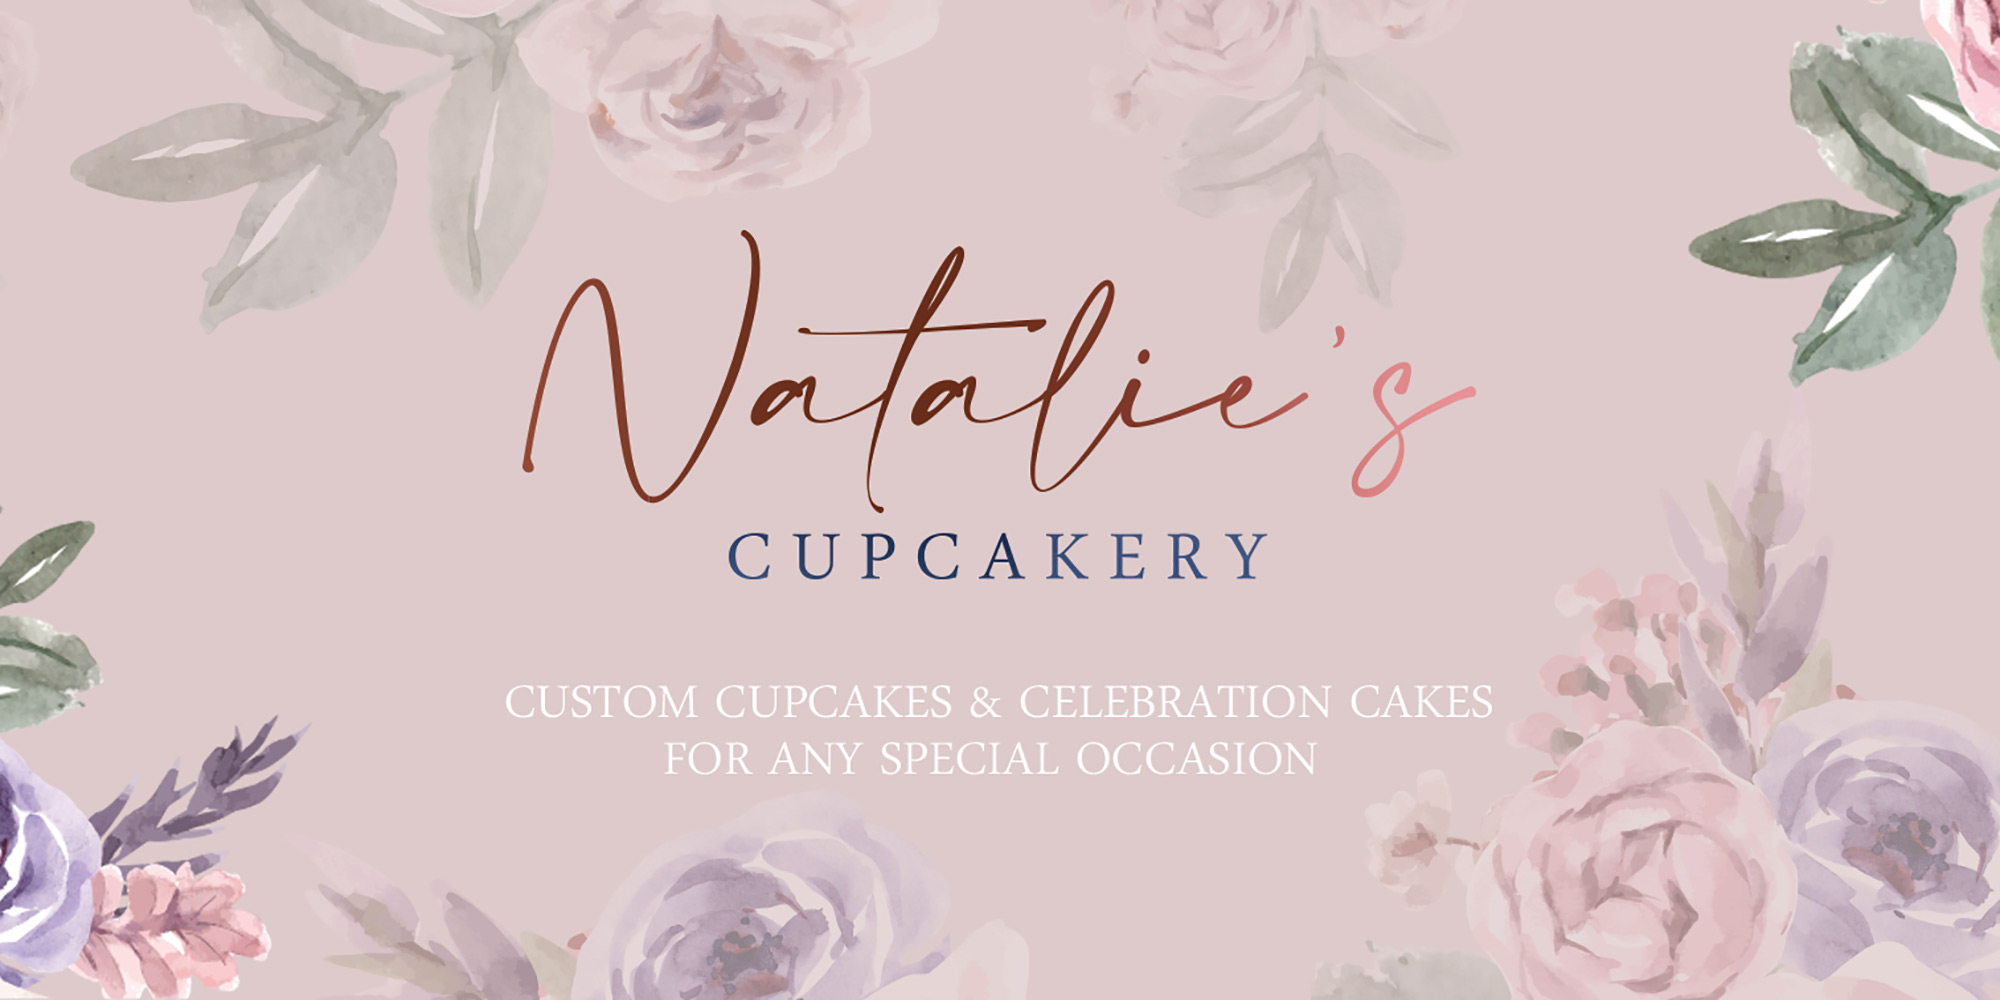 Natalie's Cupcakery